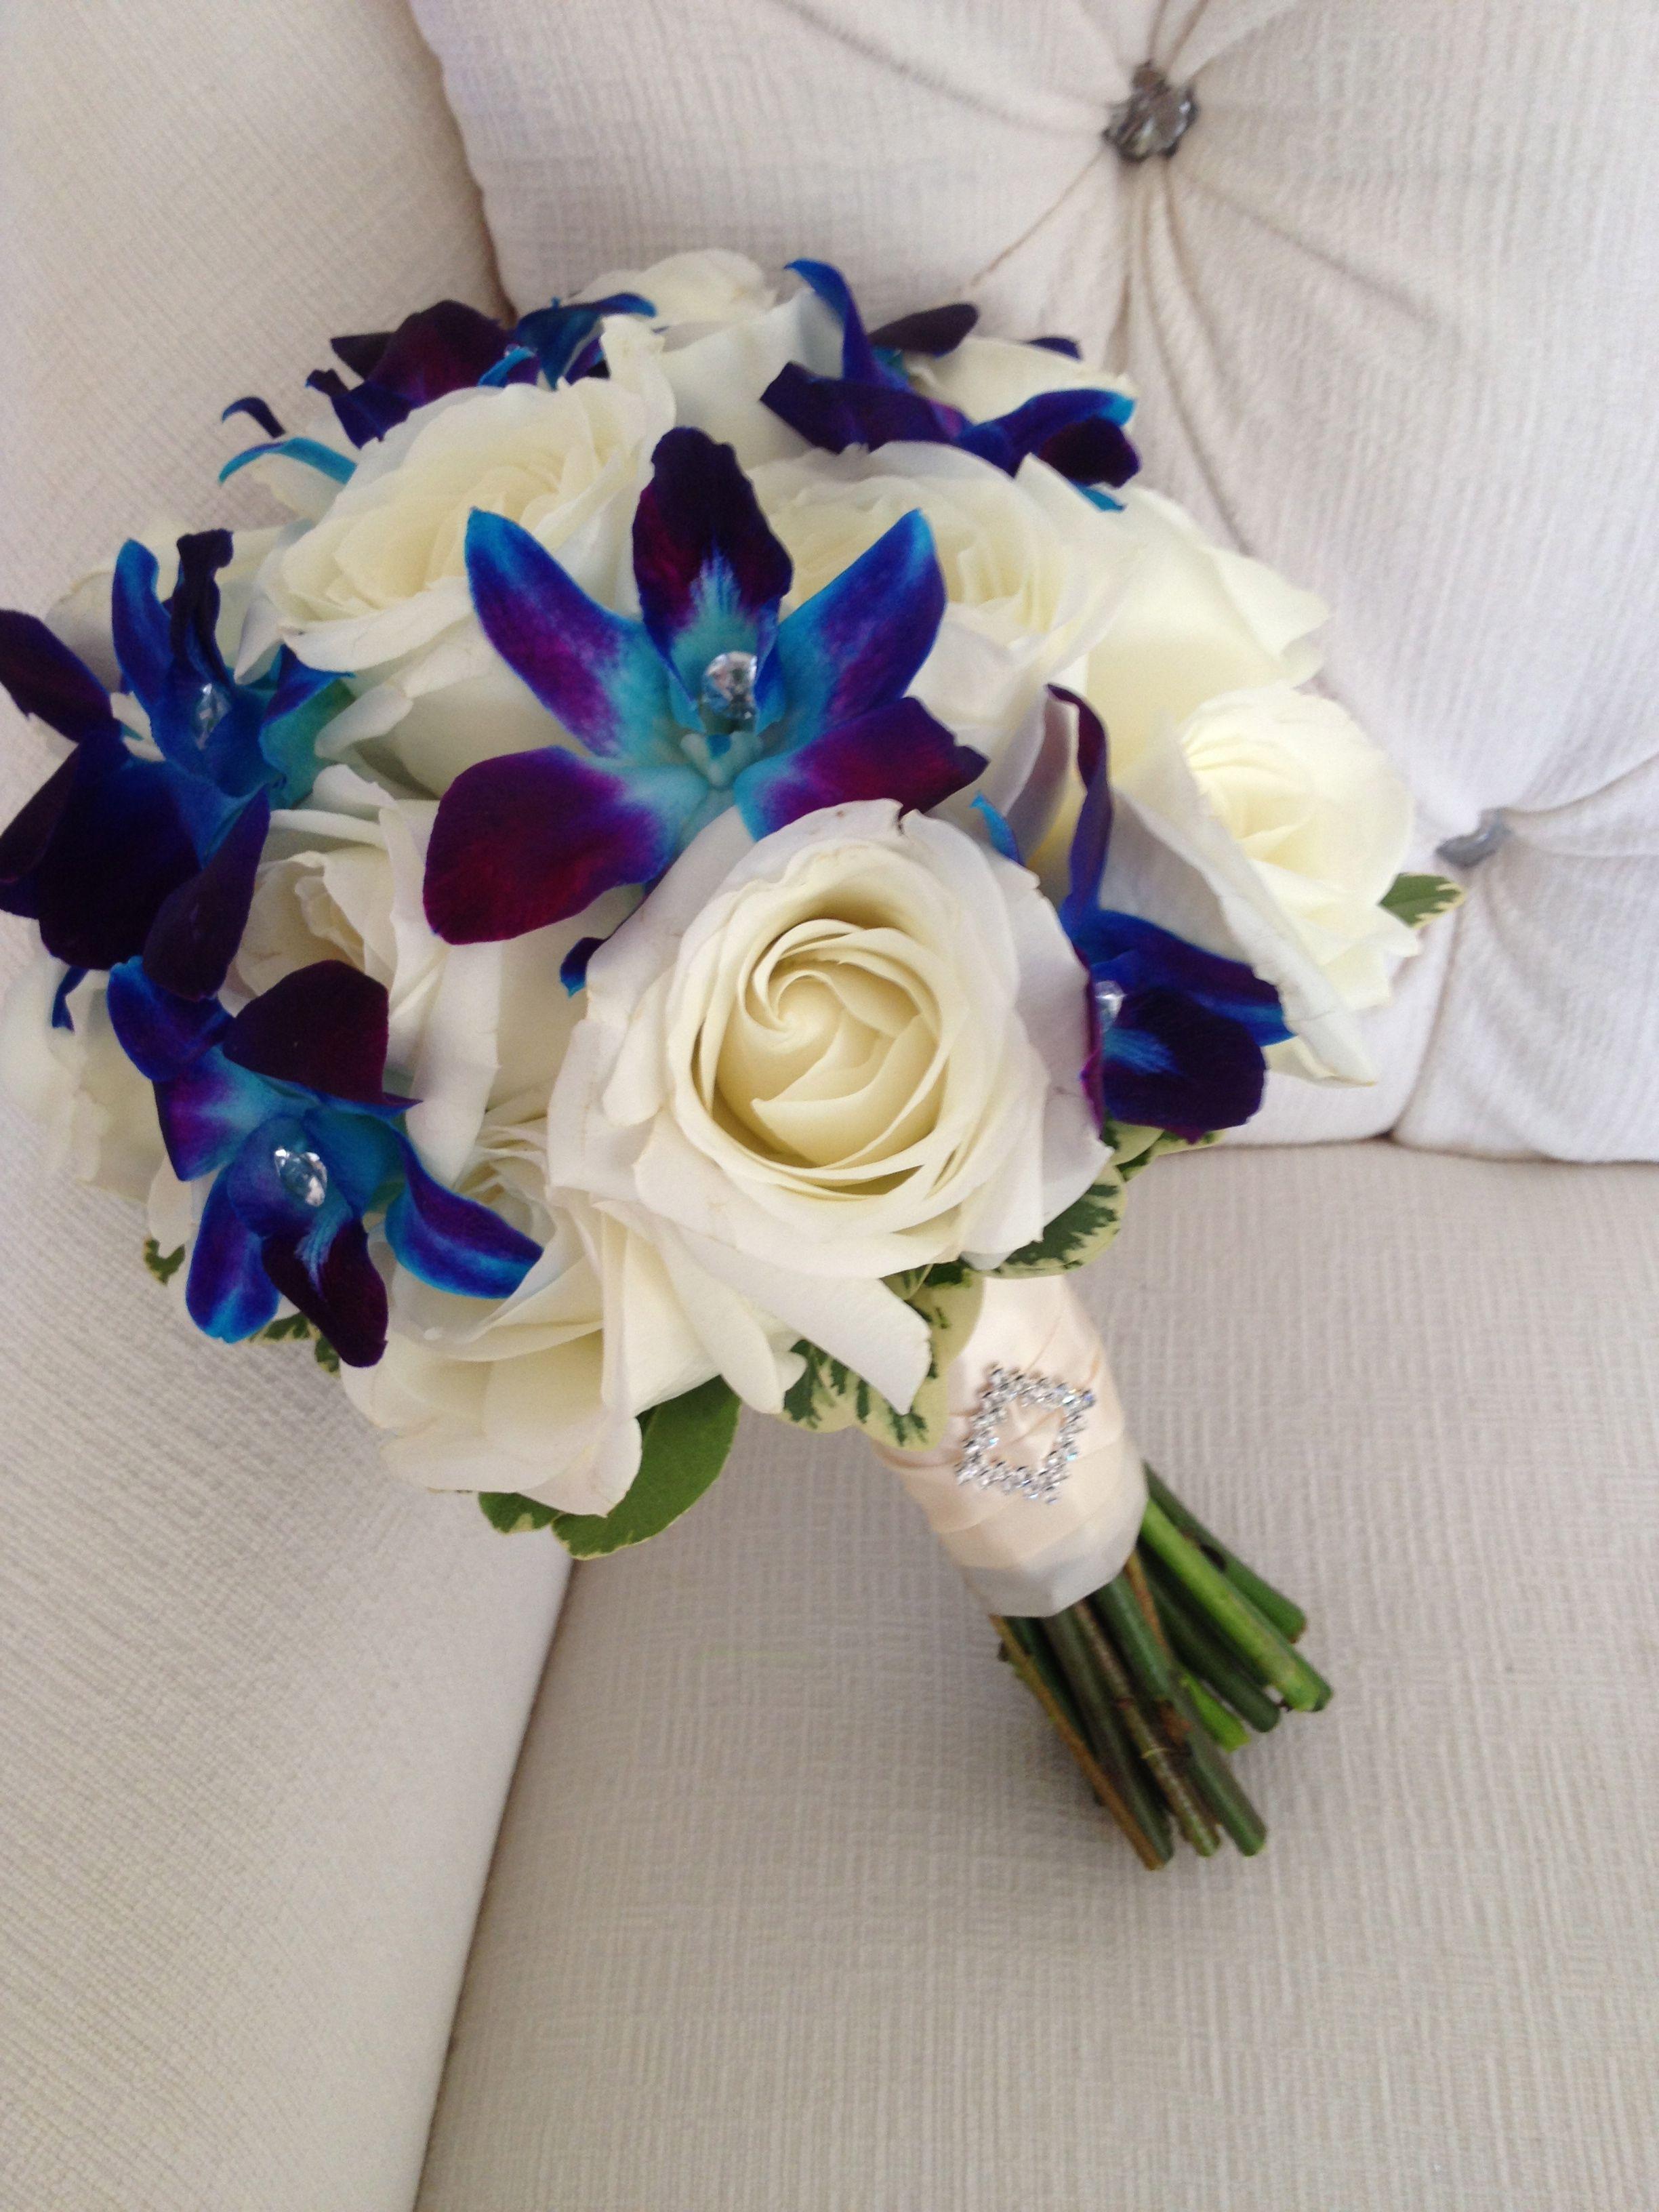 Img2904g 24483264 wedding 2017 pinterest wedding prom flowers izmirmasajfo